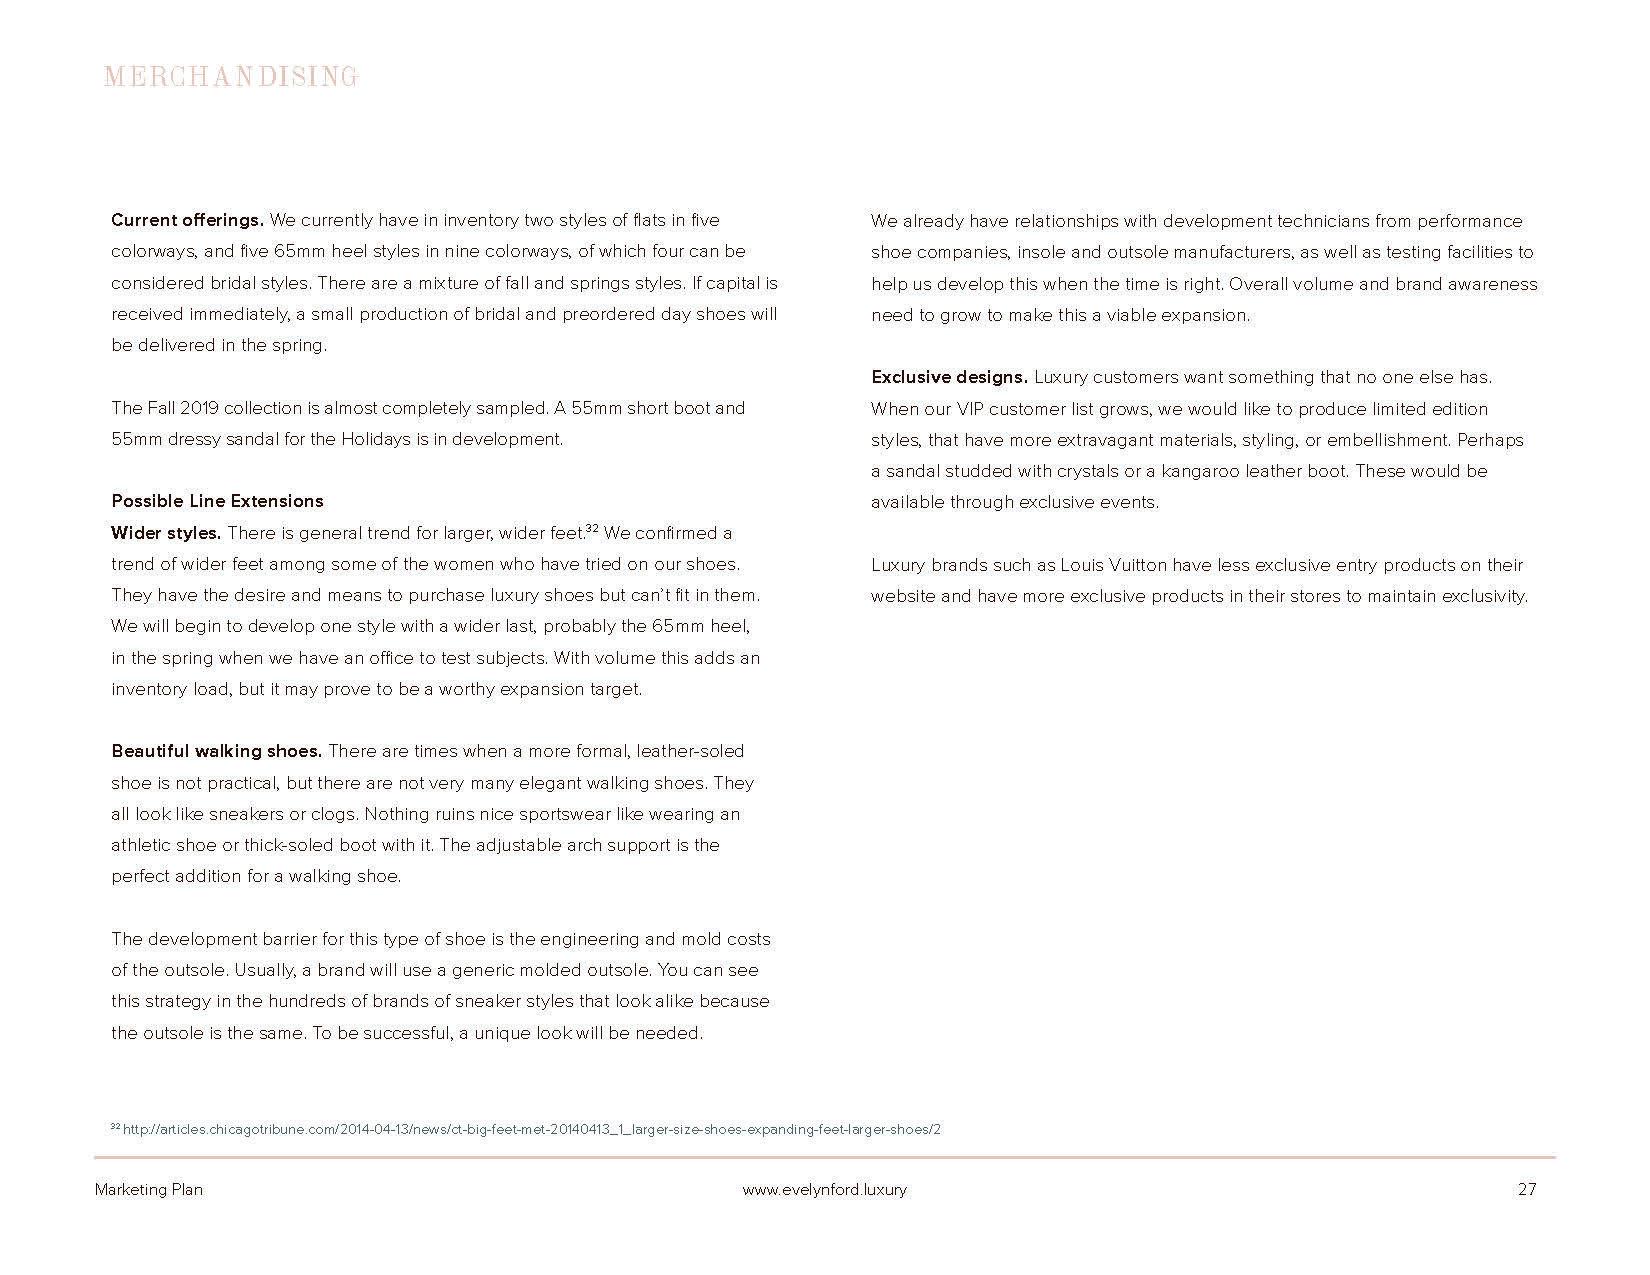 EFL_Marketing_Plan_110118_Page_27.jpg